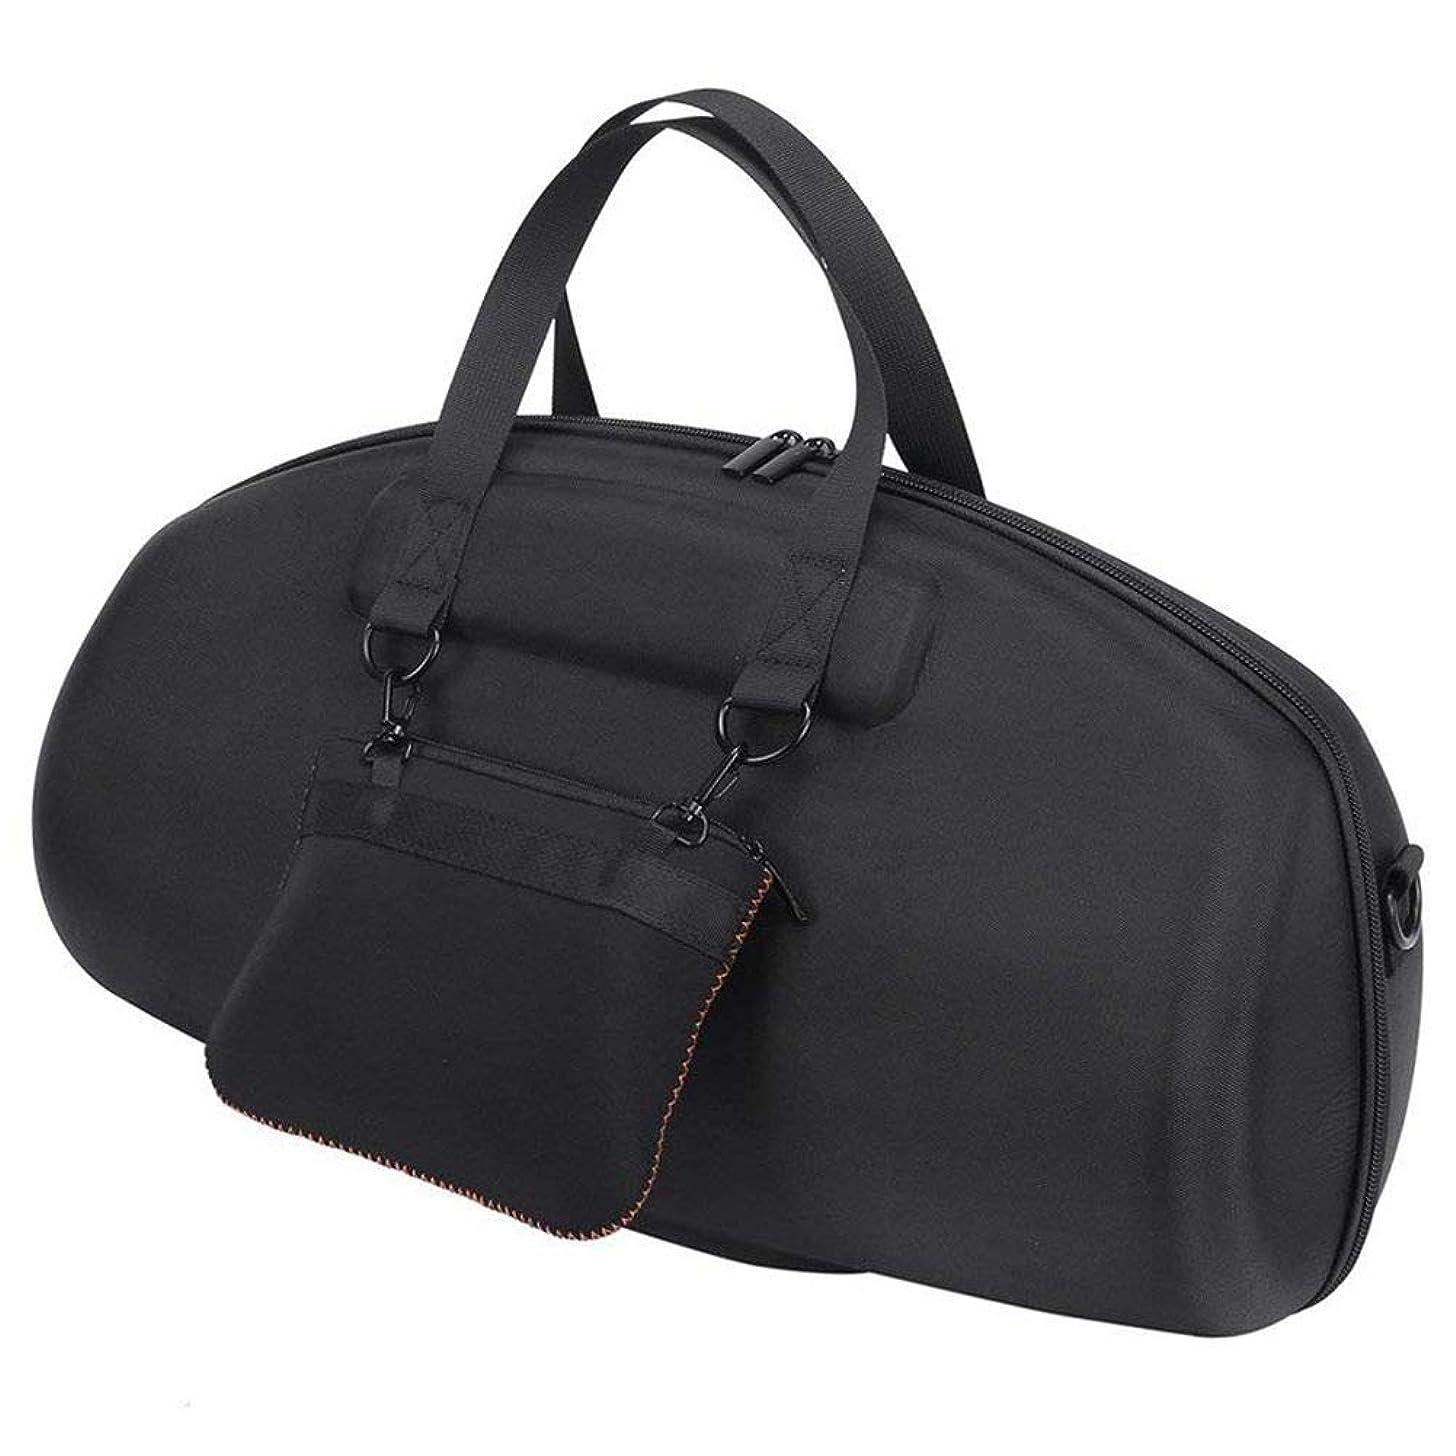 Semoic for JBL Boombox Portable Bluetooth Waterproof Speaker Hard Case Carry Bag Protective Box (Black)